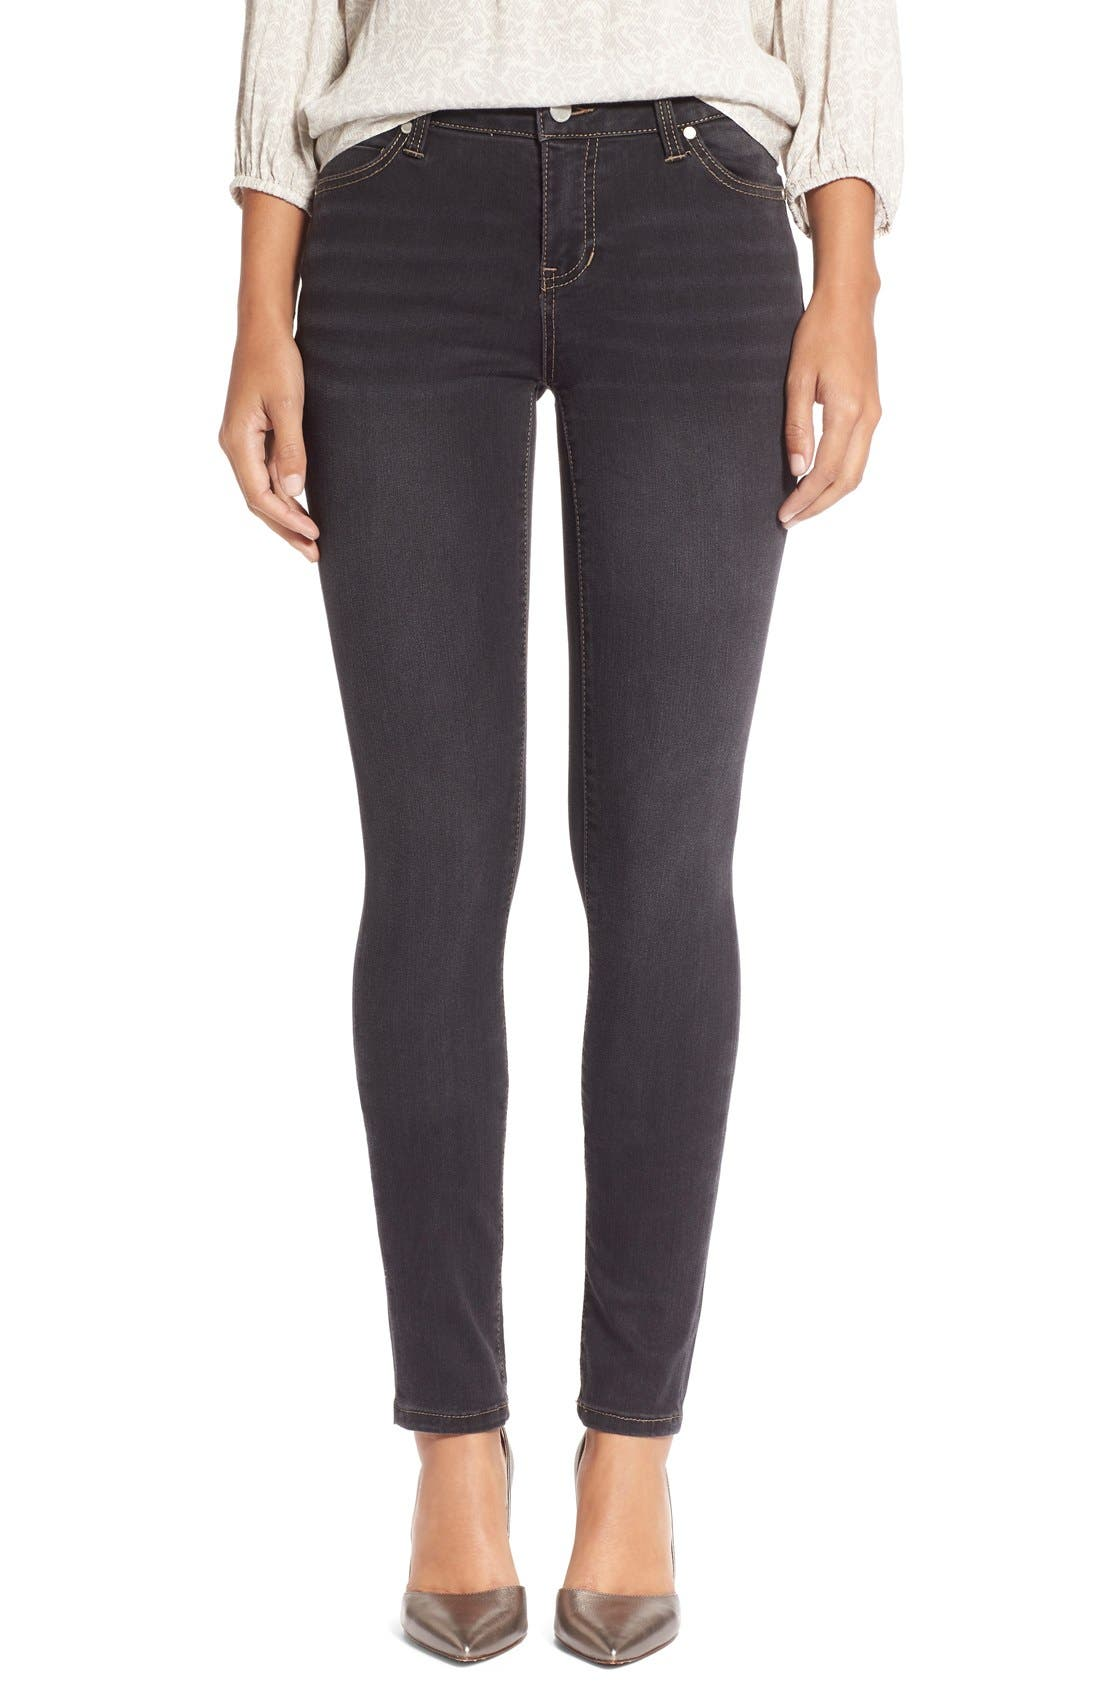 LIVERPOOL JEANS COMPANY 'Abby' StretchSkinny Jeans